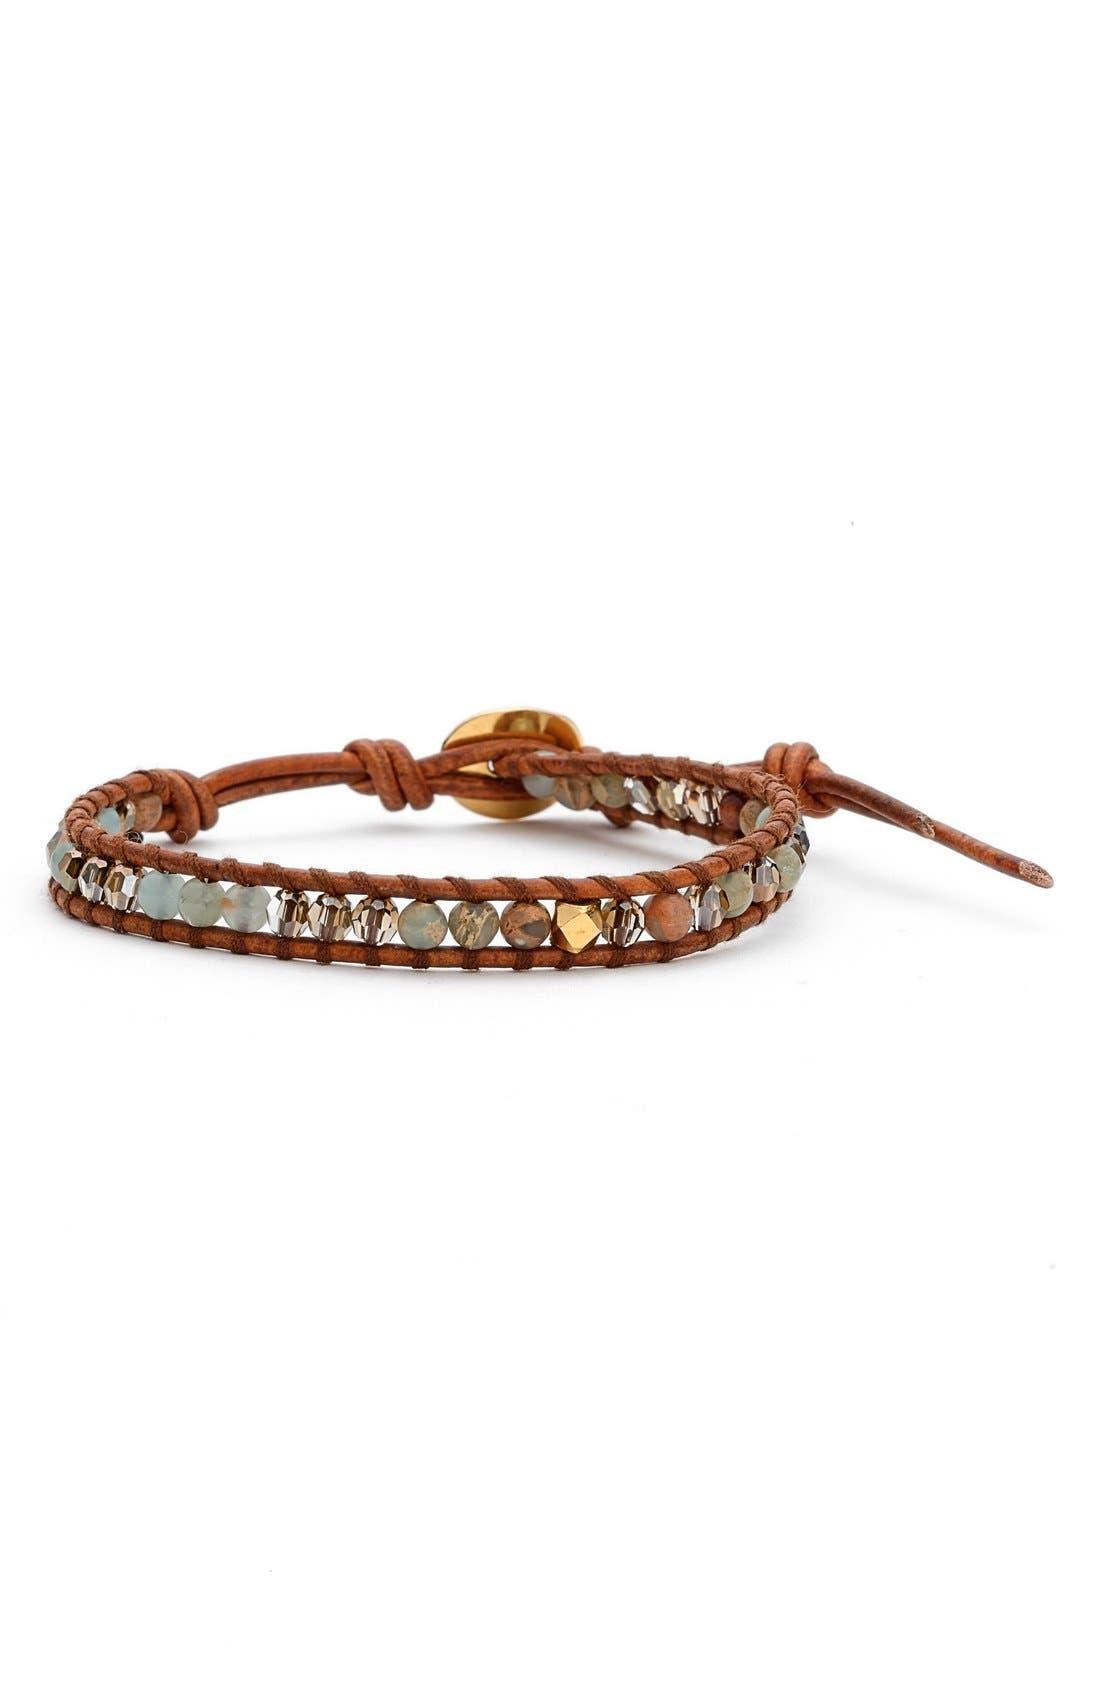 Alternate Image 1 Selected - Chan LuuSemiprecious StoneBeaded Leather Bracelet